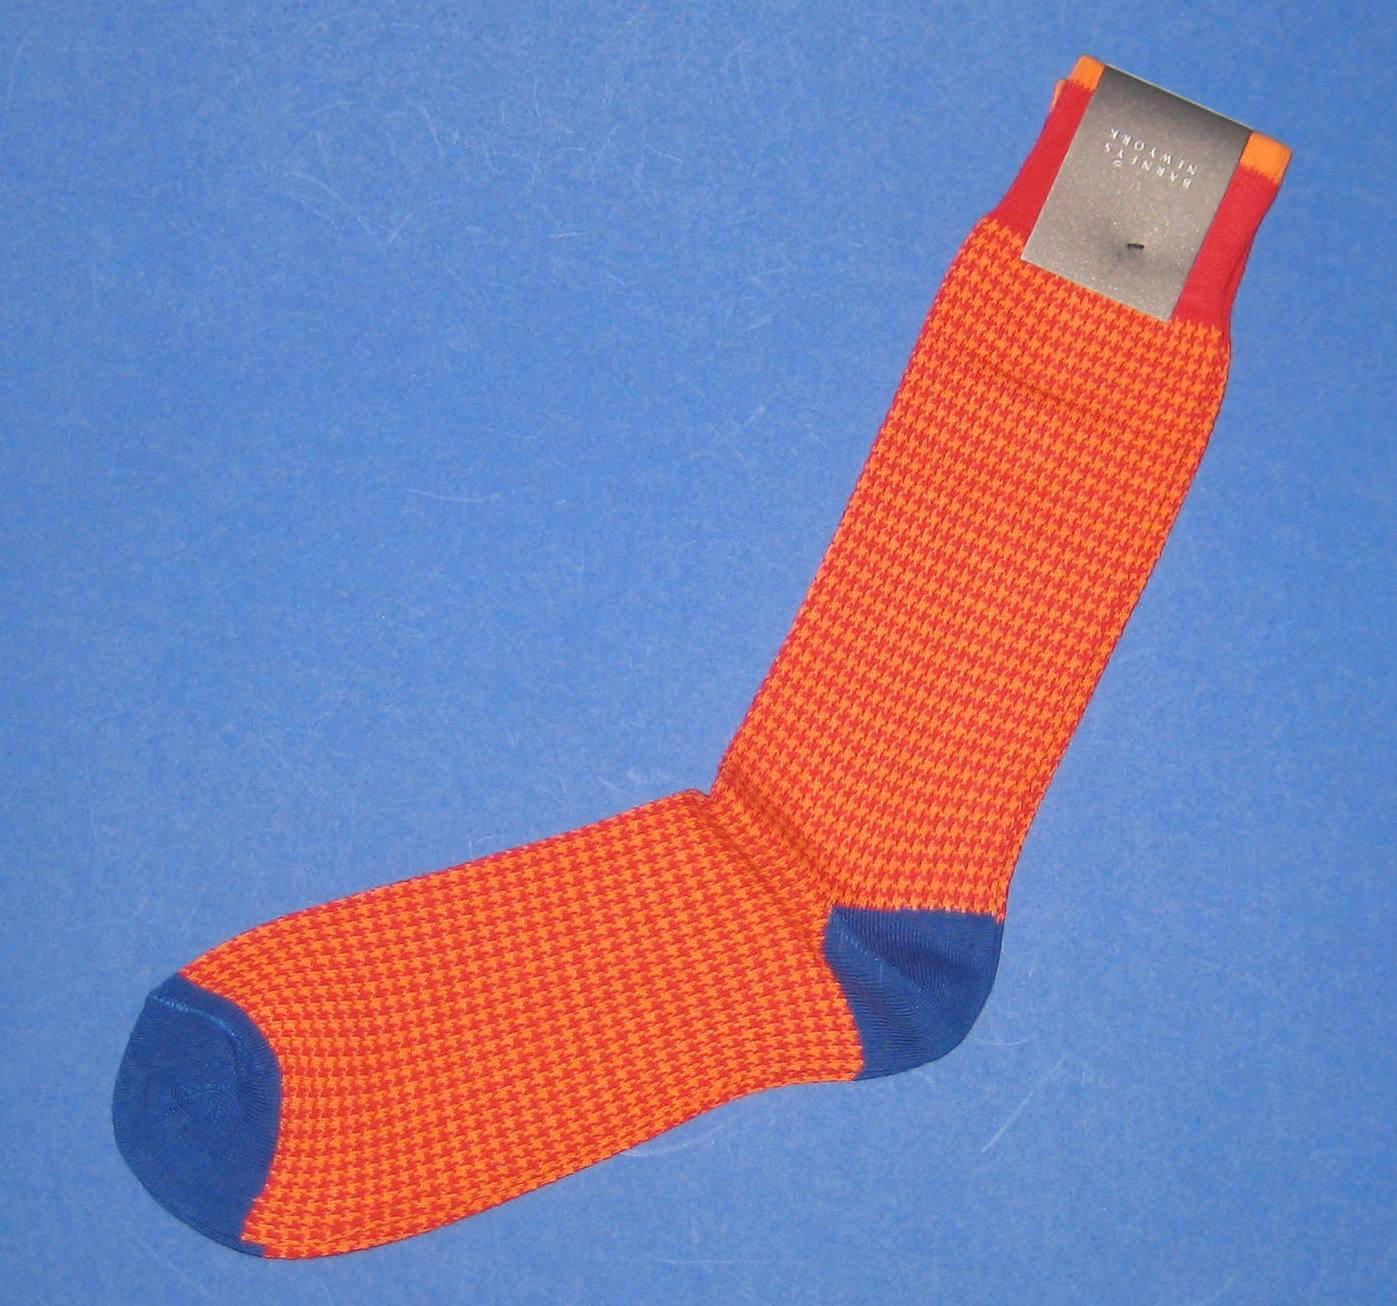 NWT Barneys New York - Italian Made Cotton Knit Orange Houndstooth Dress Socks